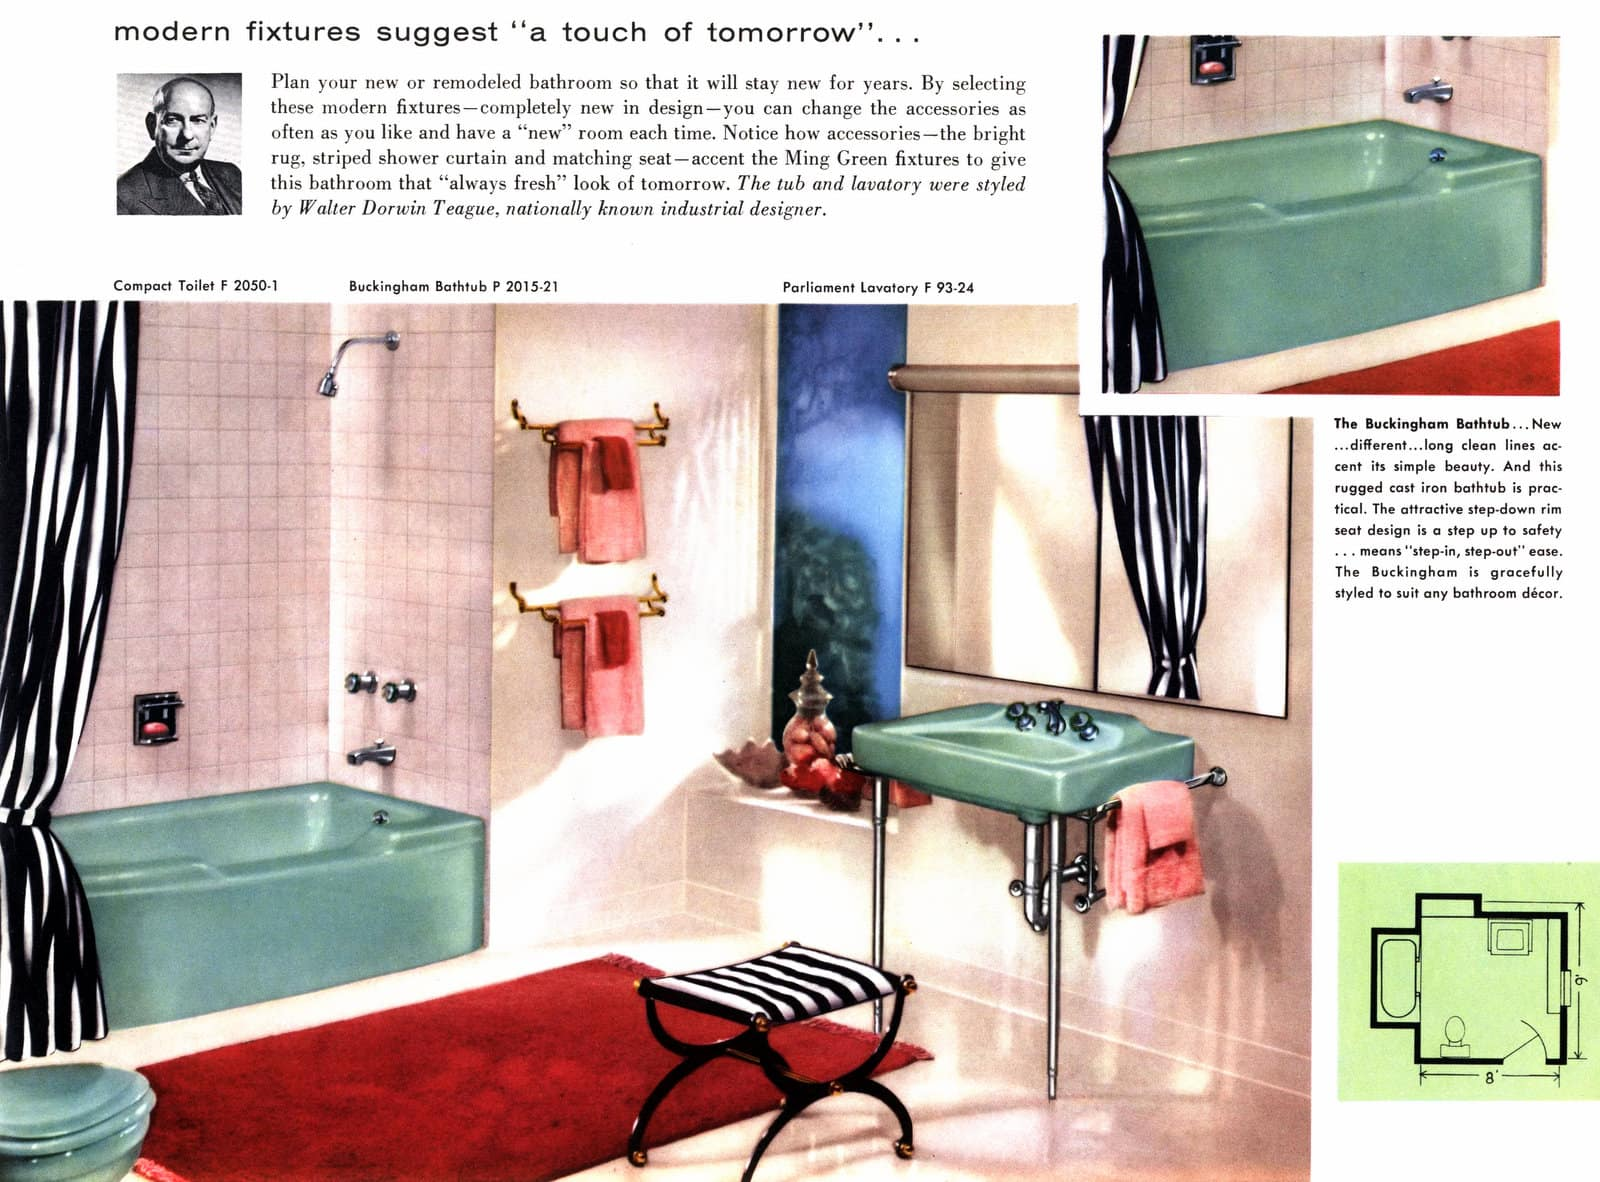 1950s bathroom decor and fixtures (5)